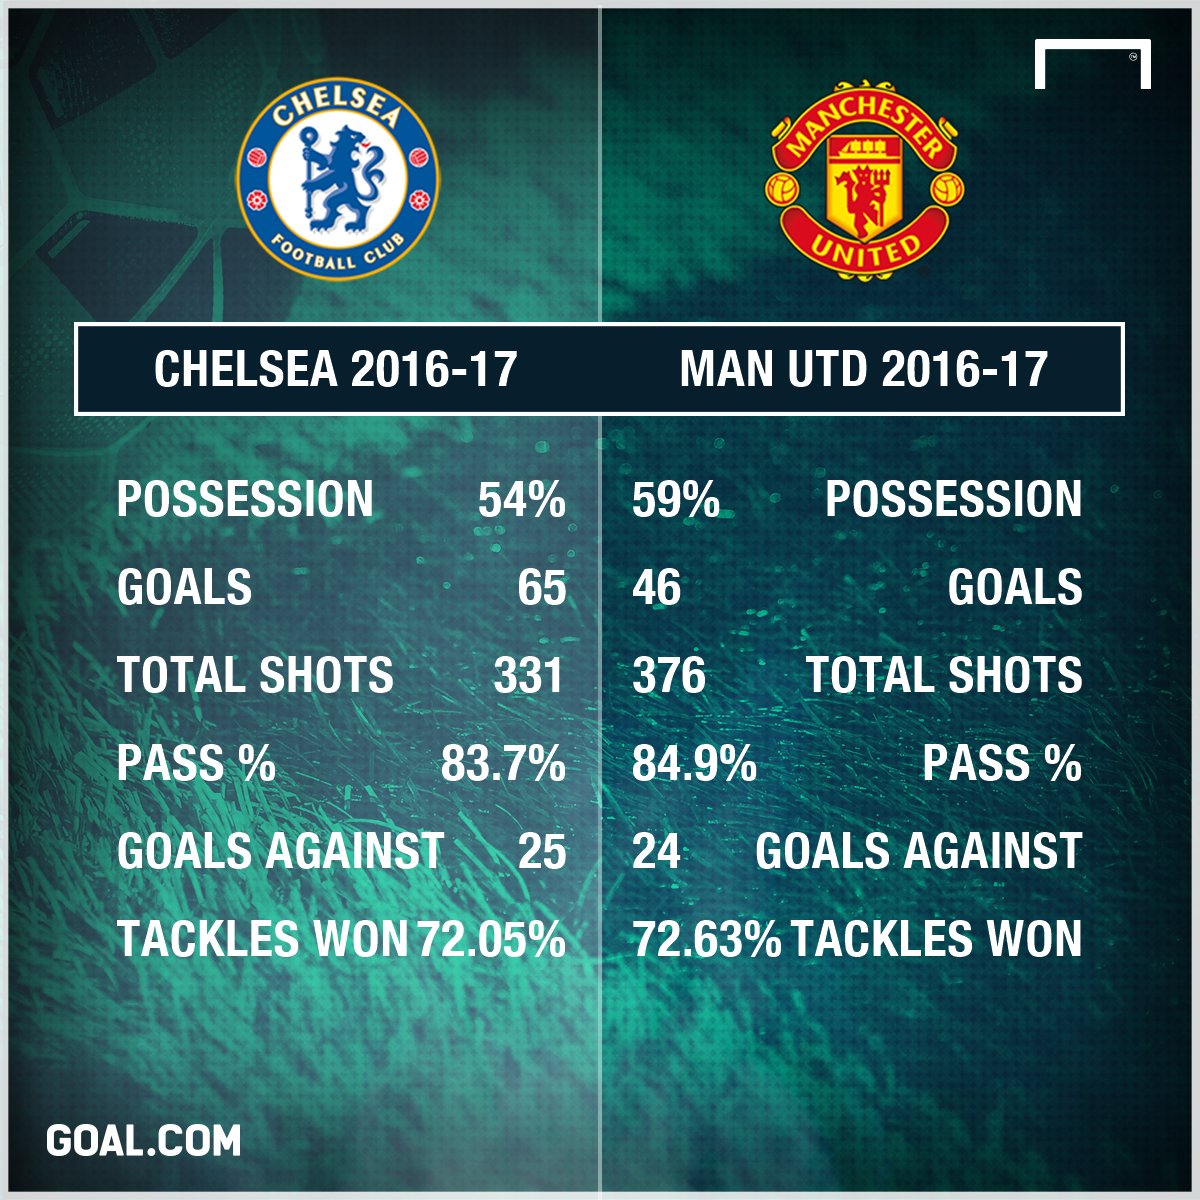 Chelsea Man Utd comparison